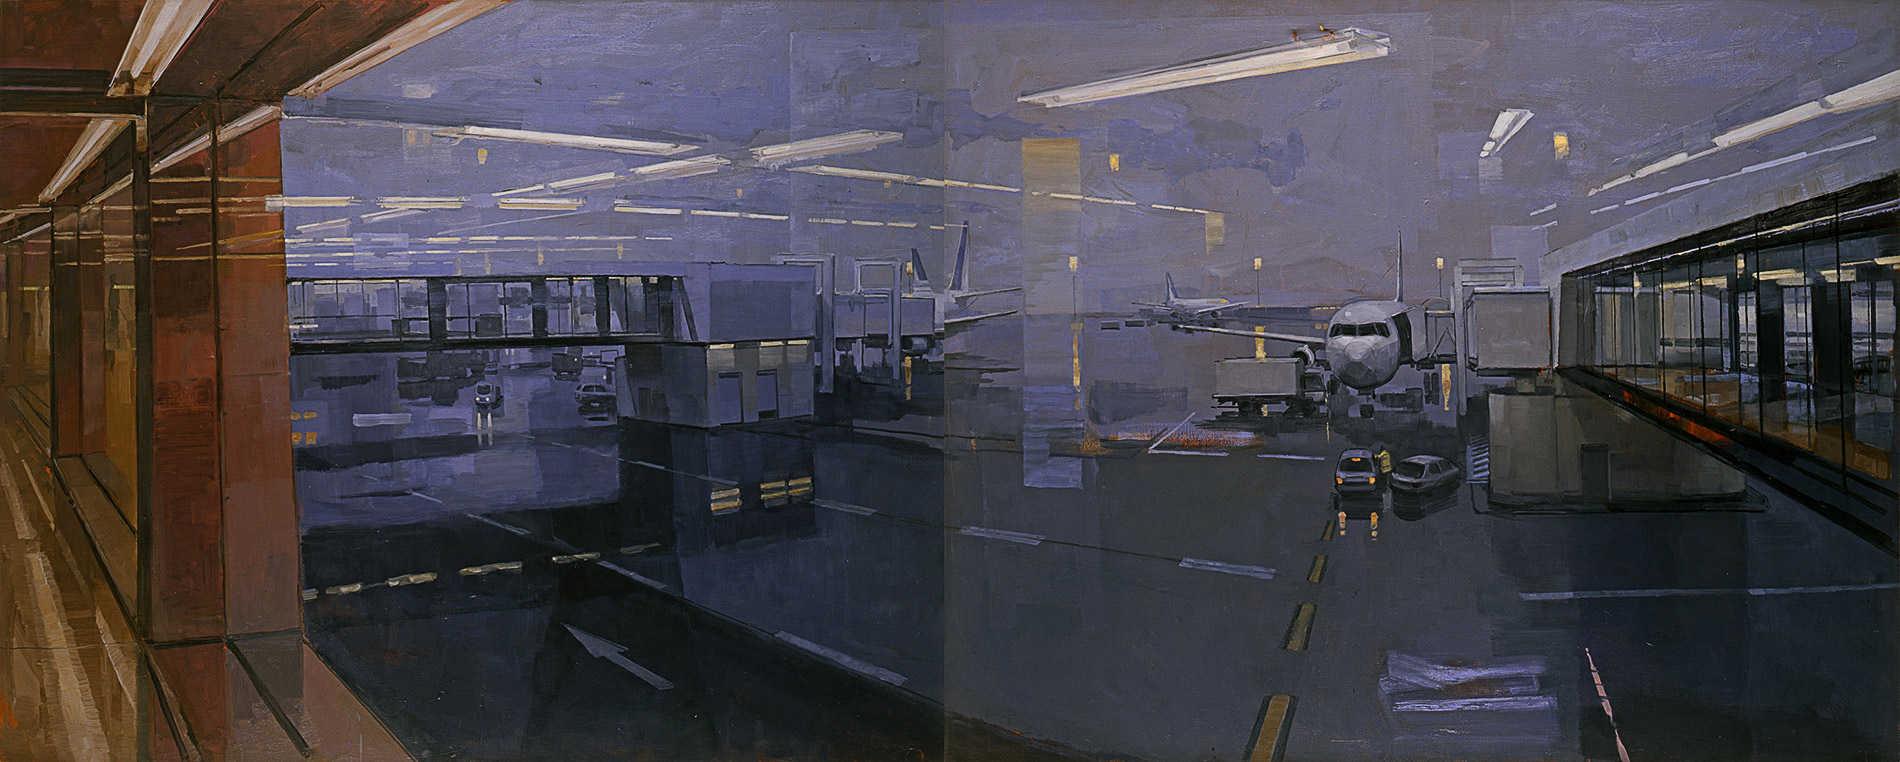 Grand Roissy. Huile sur toile, 160 x 400 cm, 2008